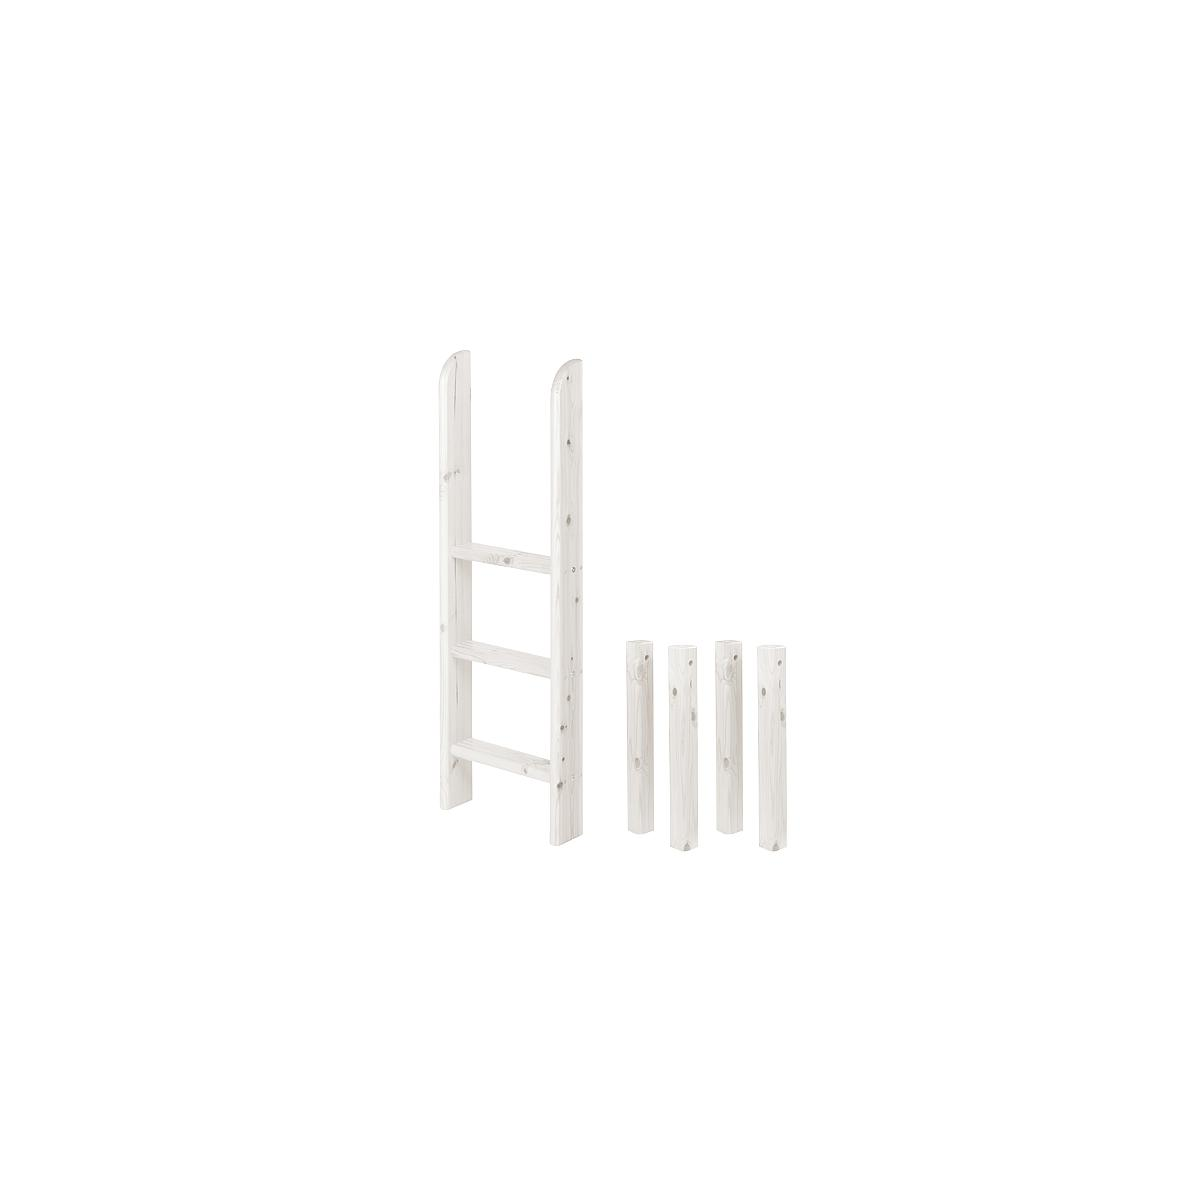 Escalera recta y patas Cama media alta CLASSIC Flexa blanco cal